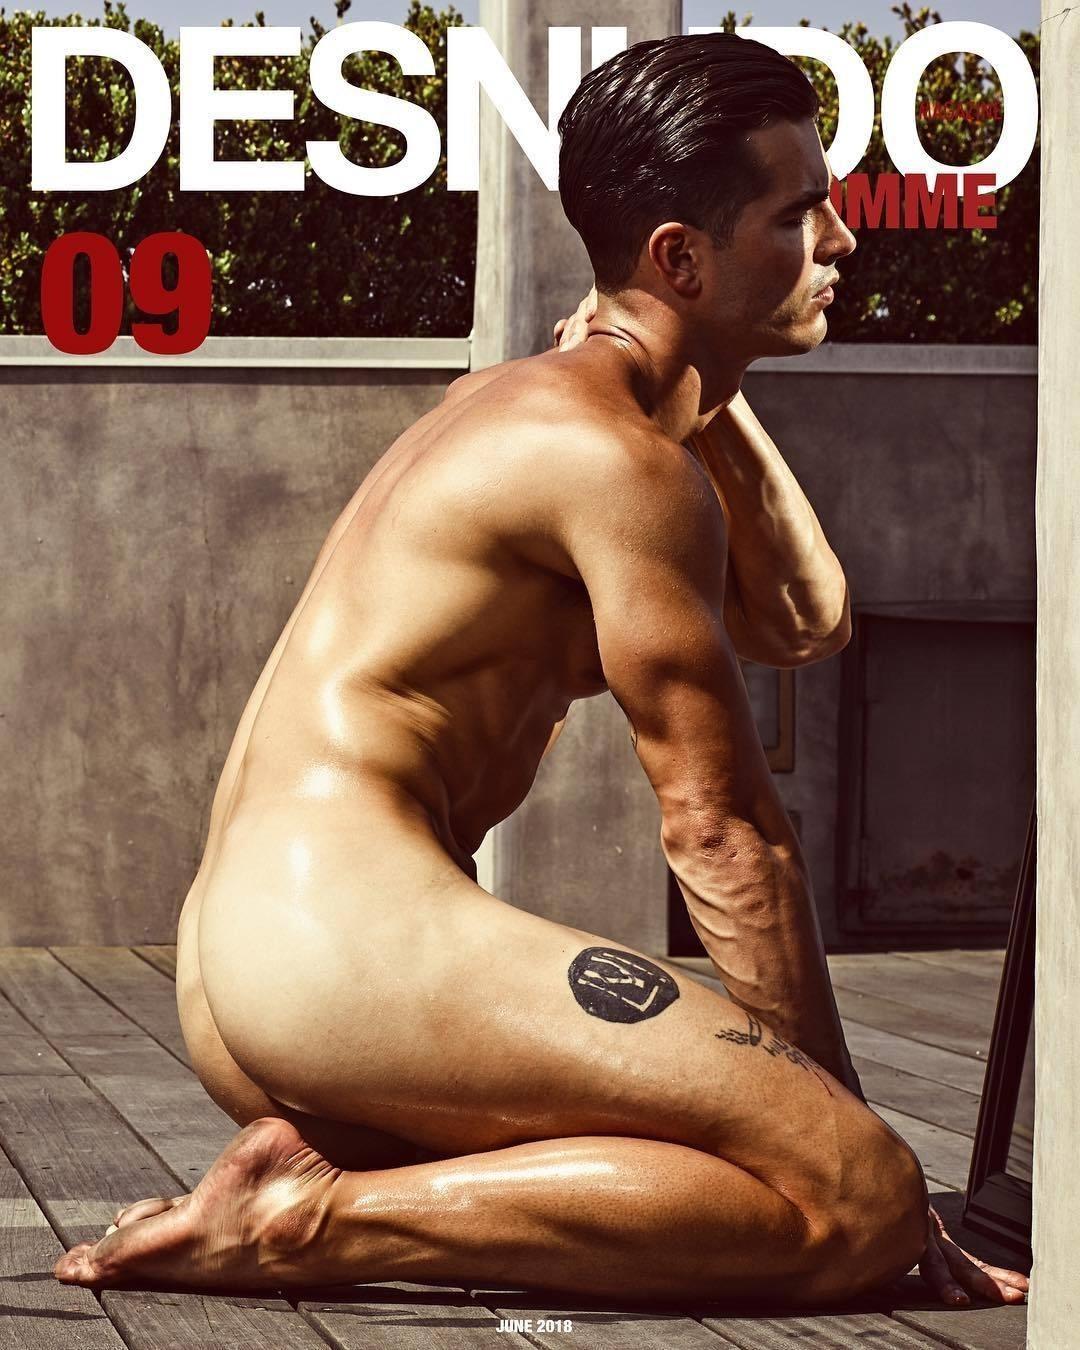 Andrea García Al Desnudo desnudo magazine: andrew biernatbrian kaminski – image